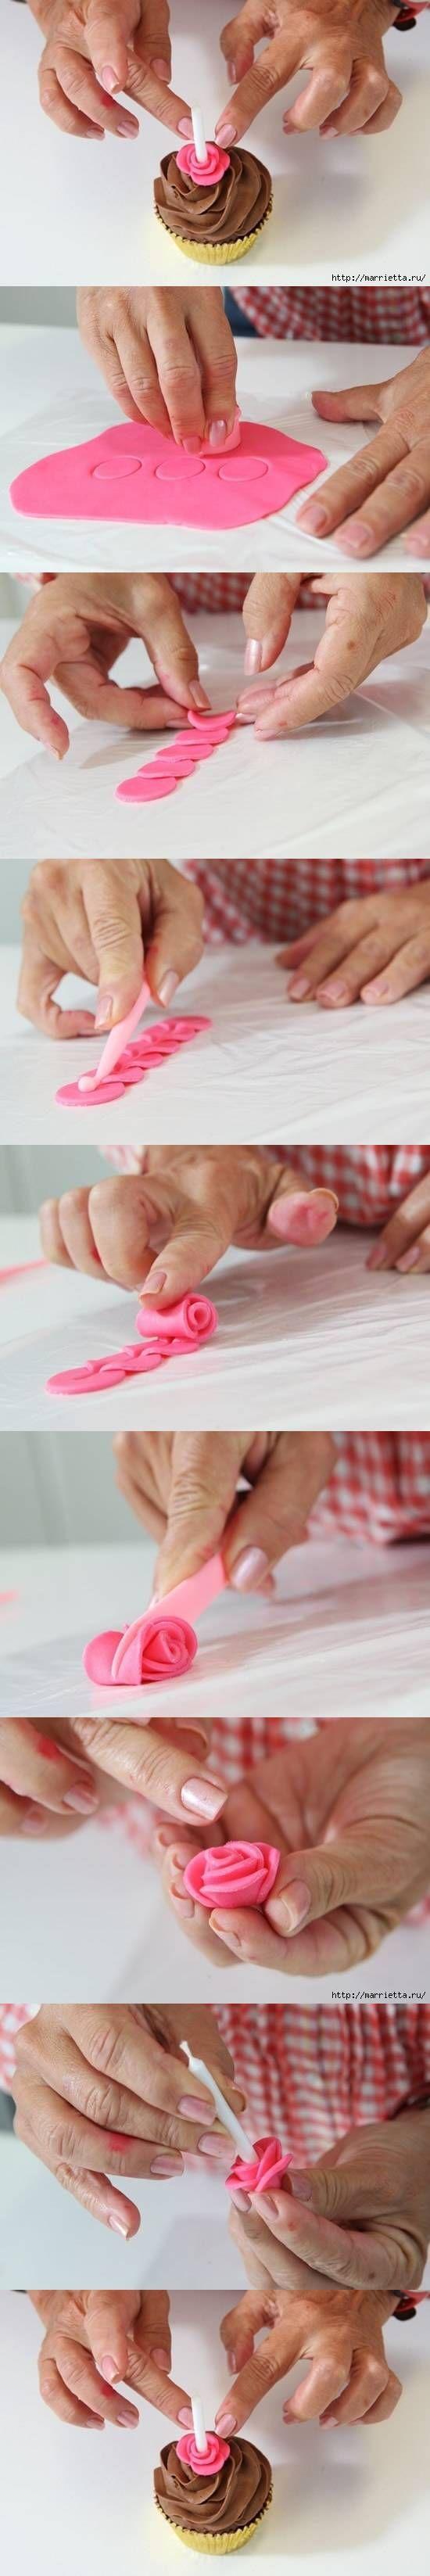 DIY Cupcakes Roses Decoration